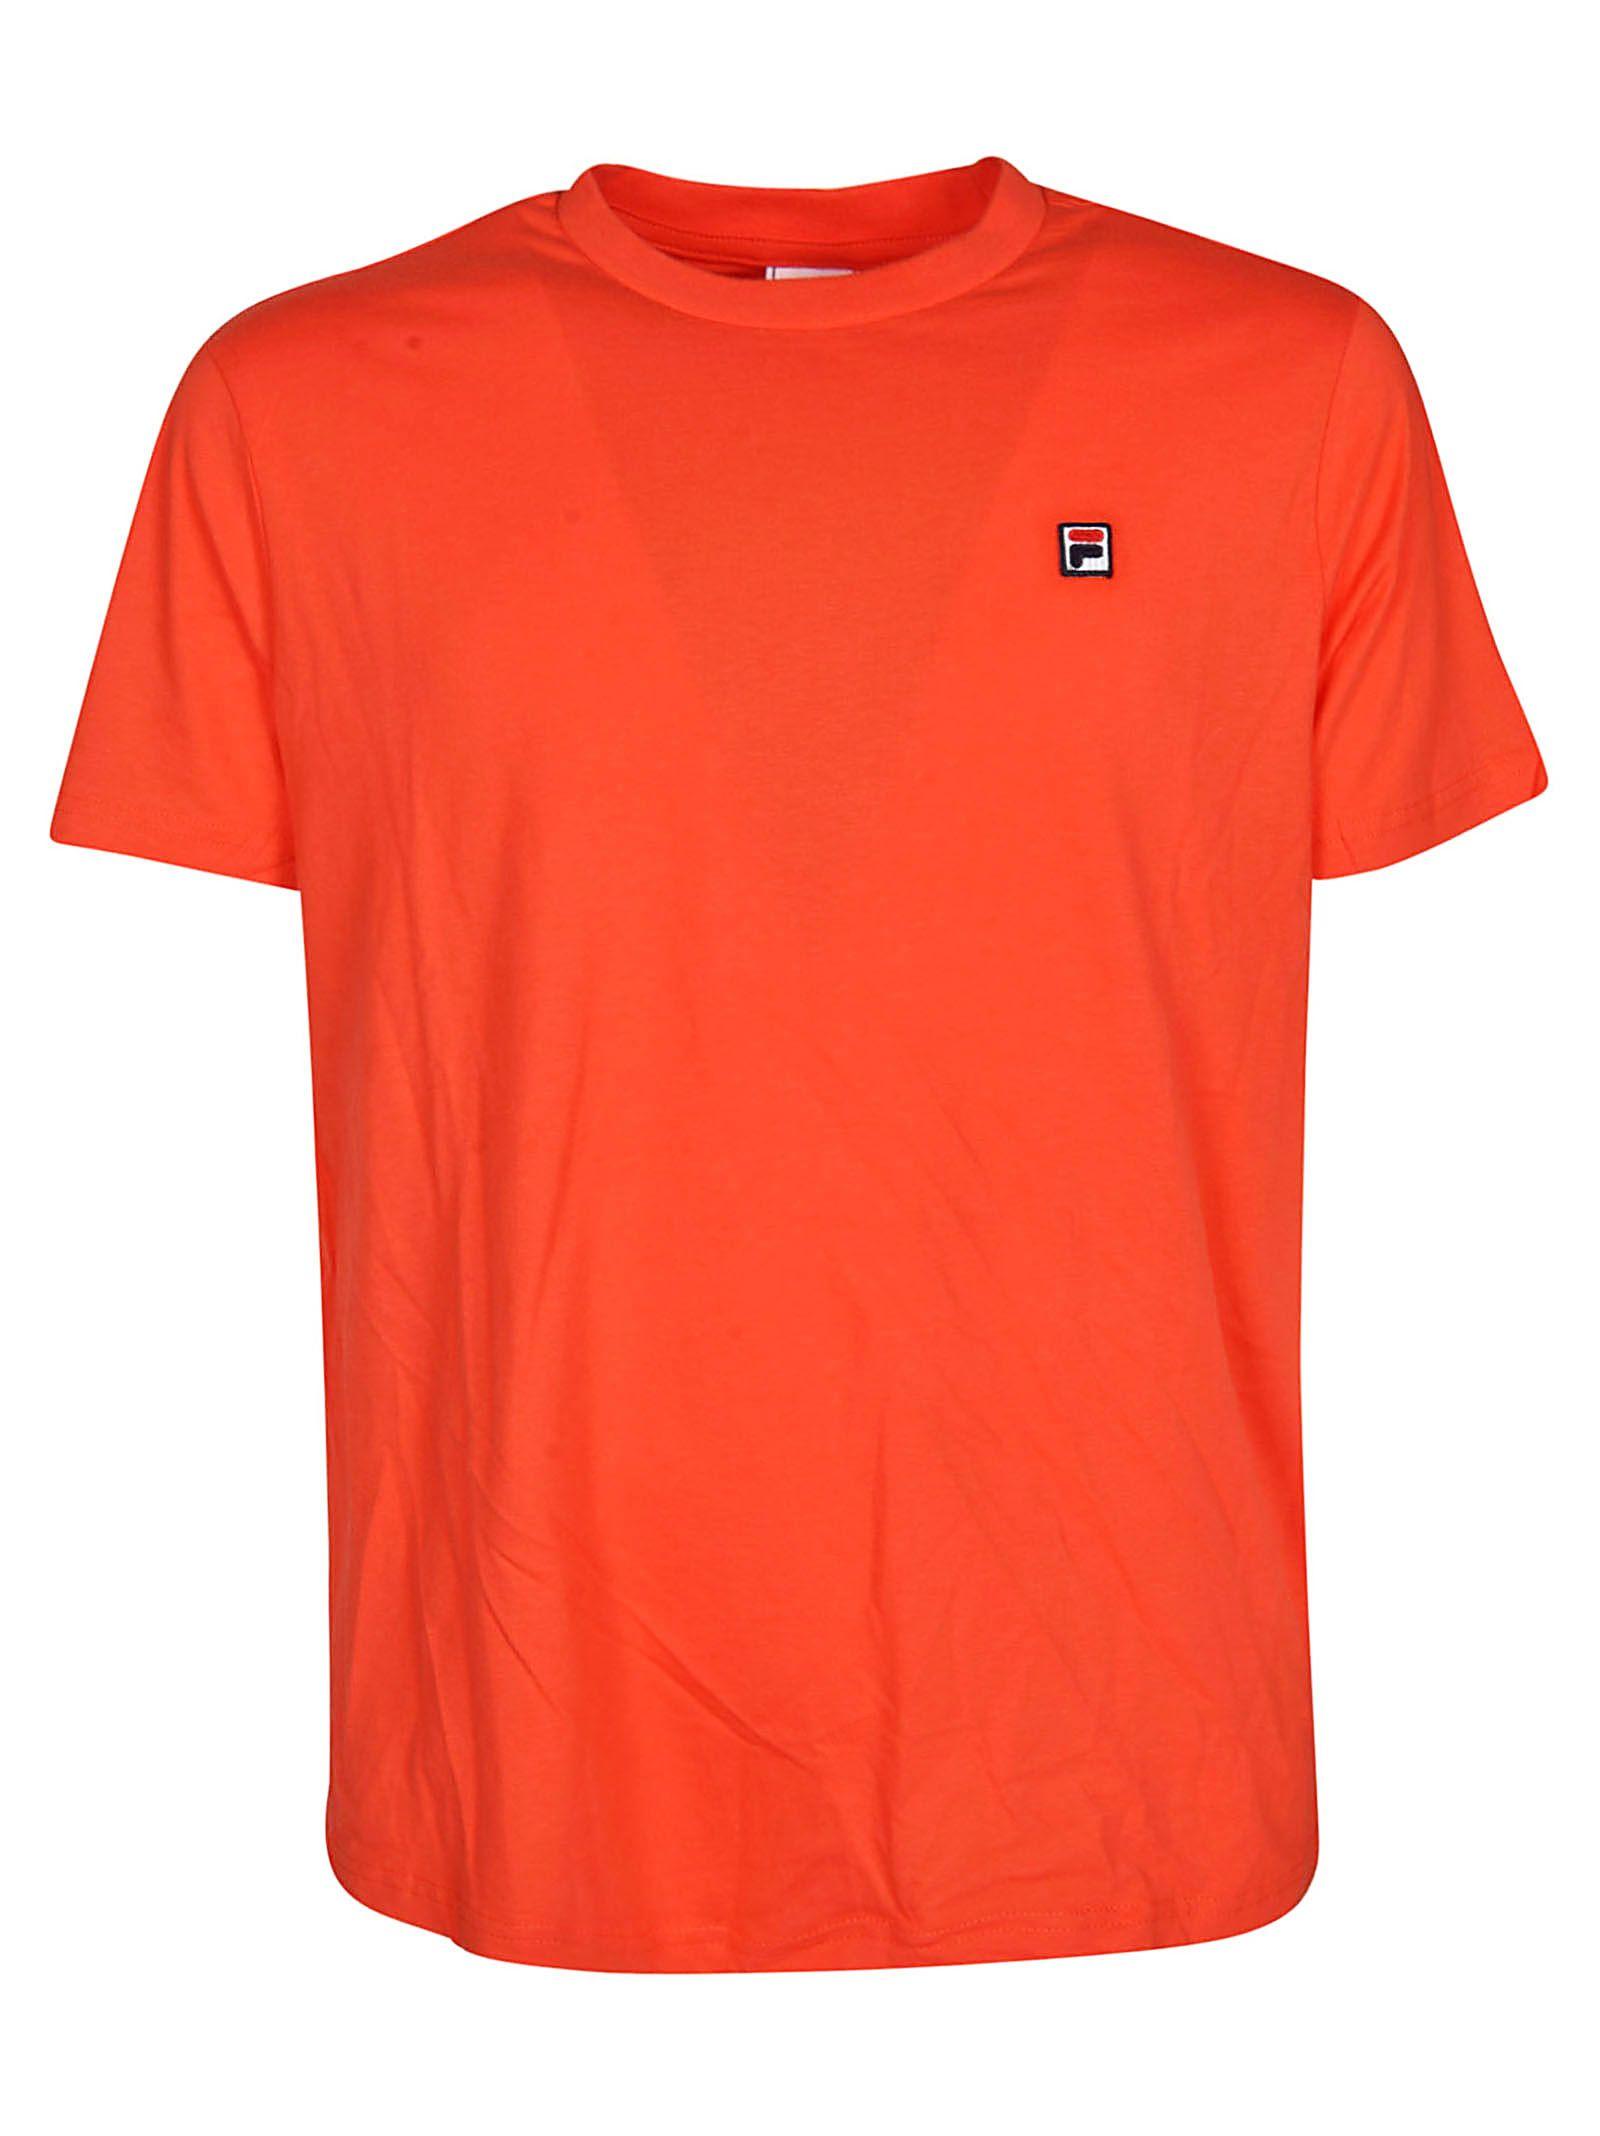 Fila Embroidered Logo T-shirt